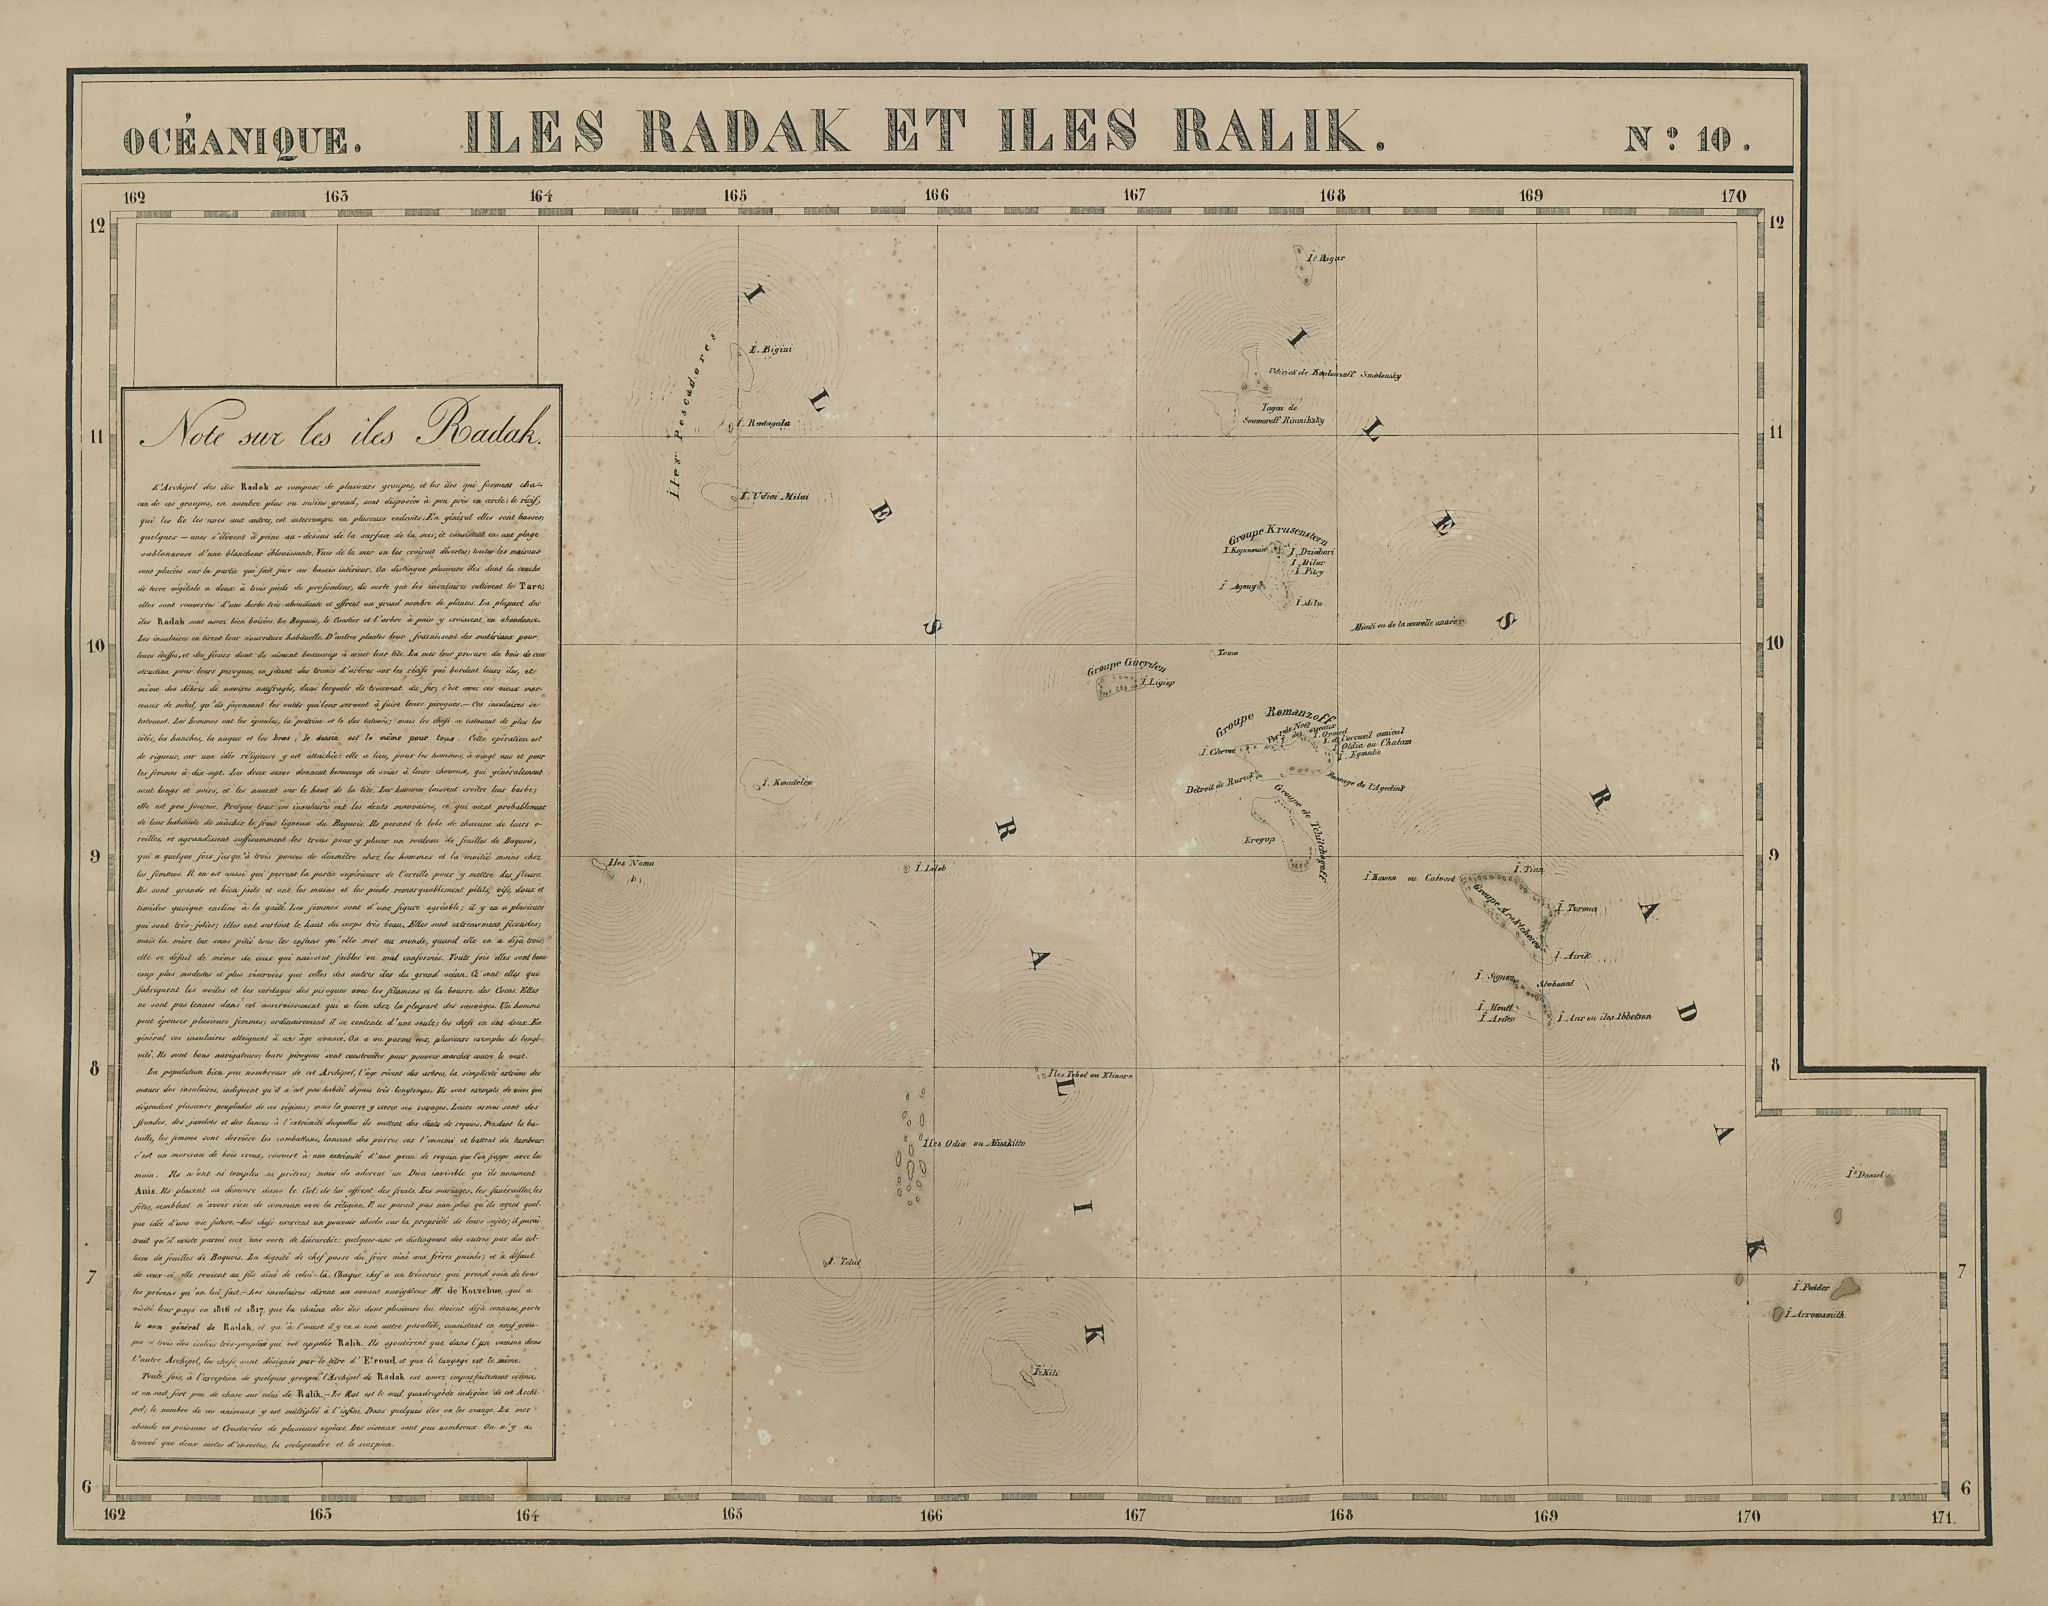 Océanique. Iles Radak et Iles Ralik #10. Marshall Islands. VANDERMAELEN 1827 map